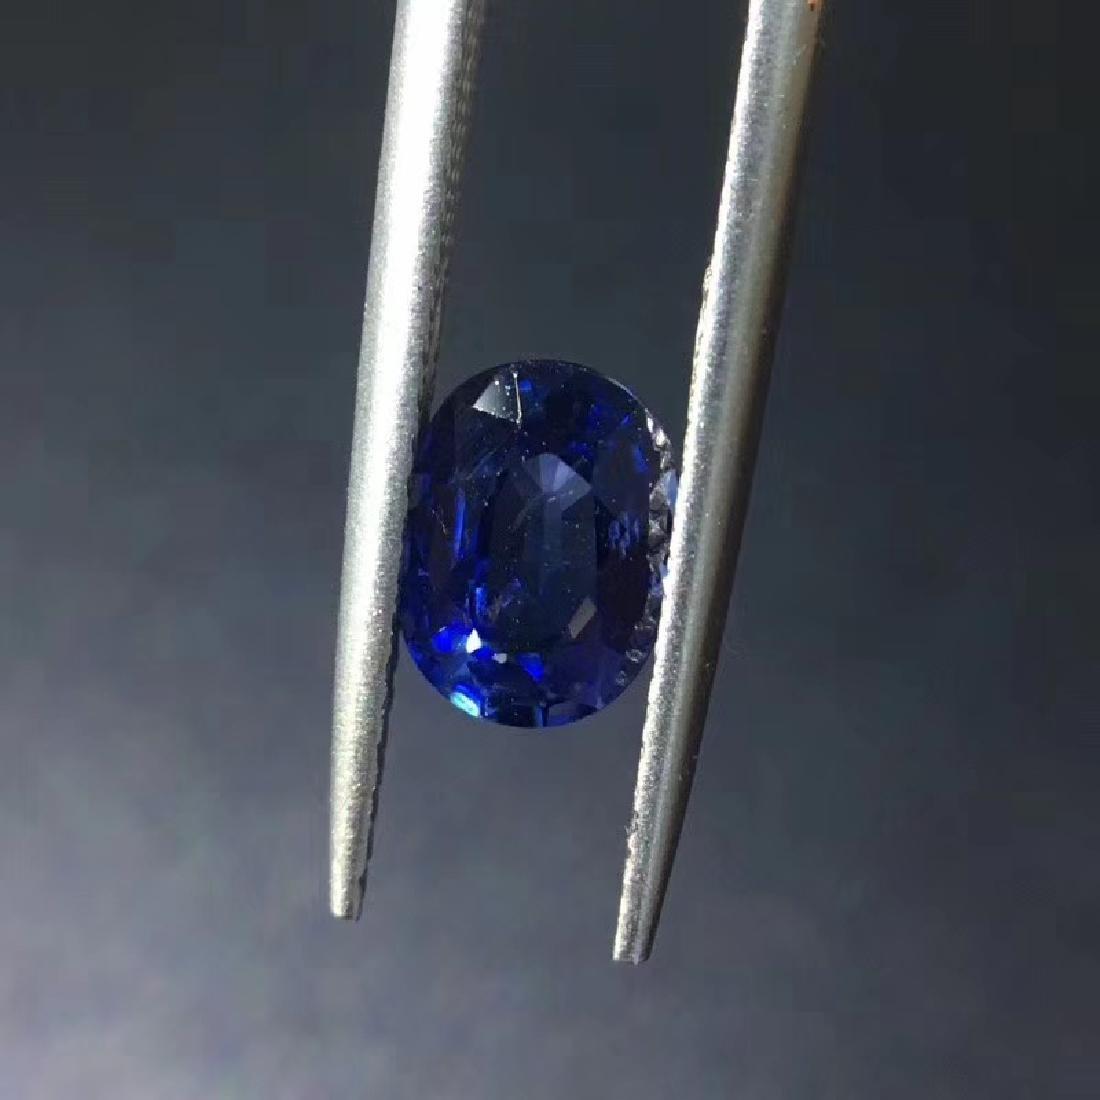 1.38 ct Sapphire 5.5*7.4*3.5 mm Oval Cut - 4